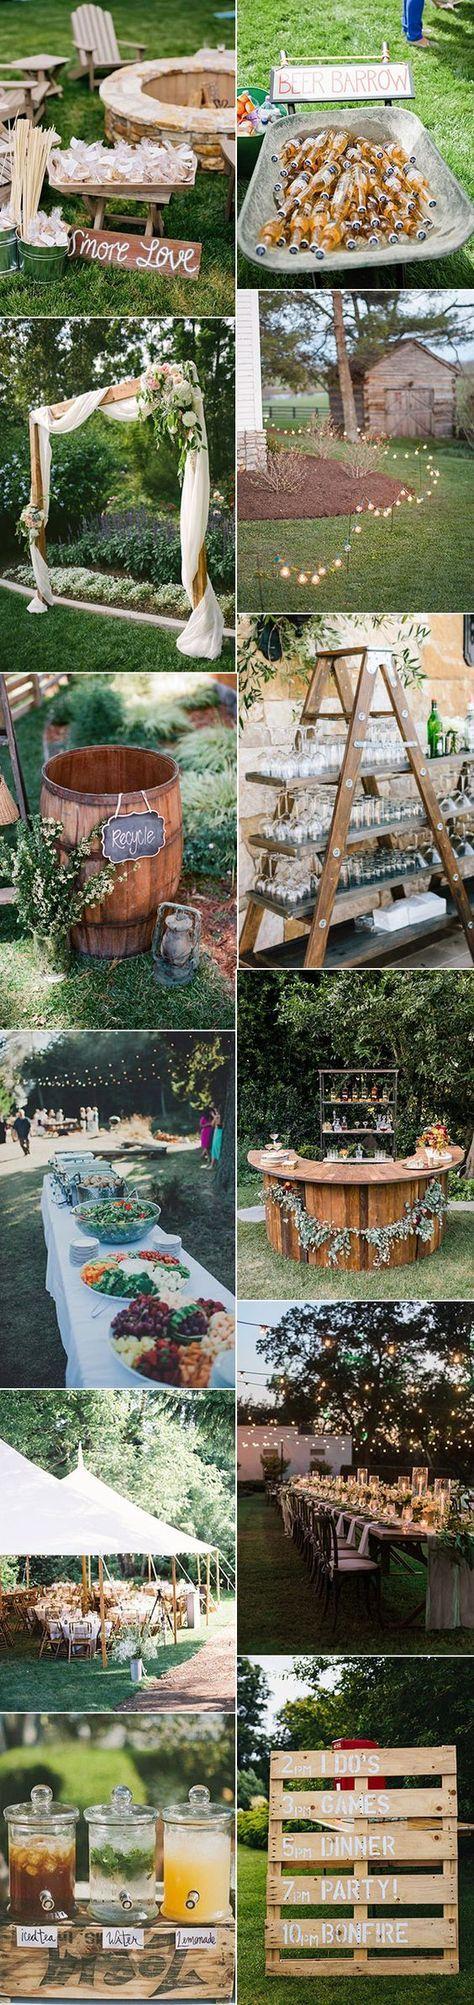 best wedding ideas images on pinterest dream wedding wedding